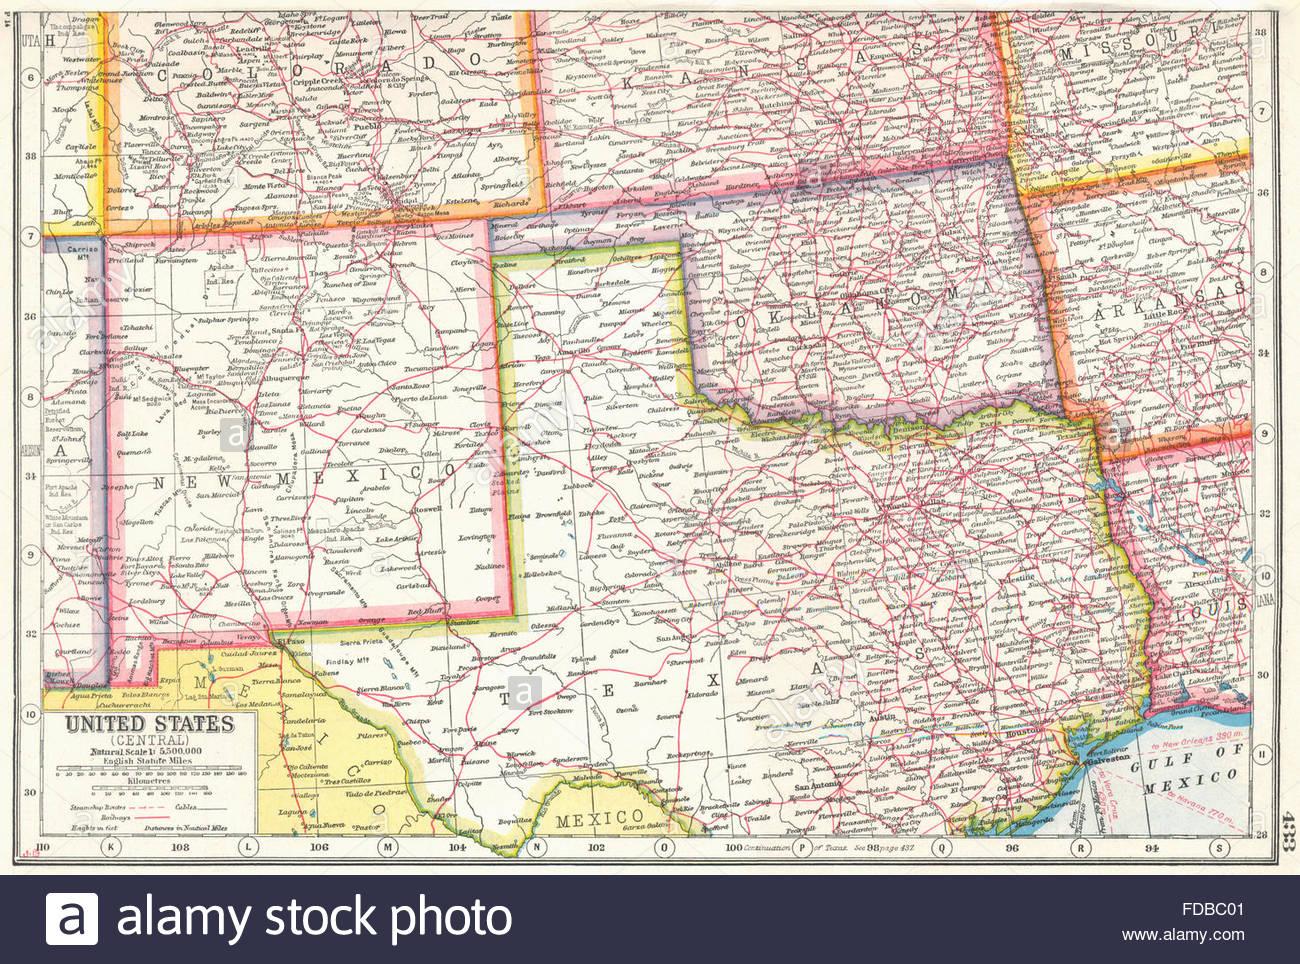 Usa South Centre: New Mexico Oklahoma North Texas. Harmsworth, 1920 - Texas New Mexico Map